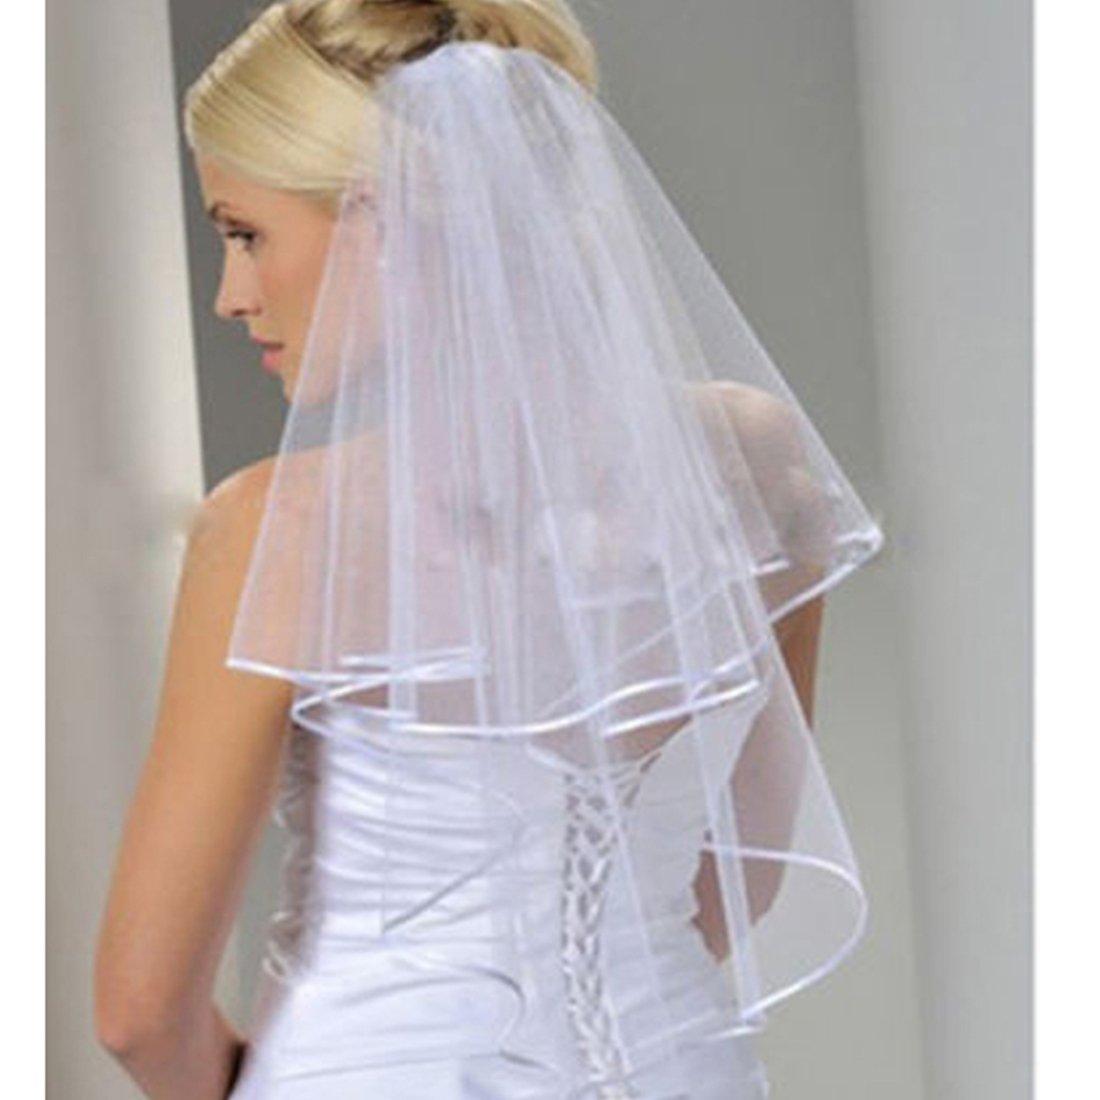 Ok Women's Cheap White Ivory Bridal Veils Two Layer Ribbon Edge Wedding Veil with Comb (Ivory)